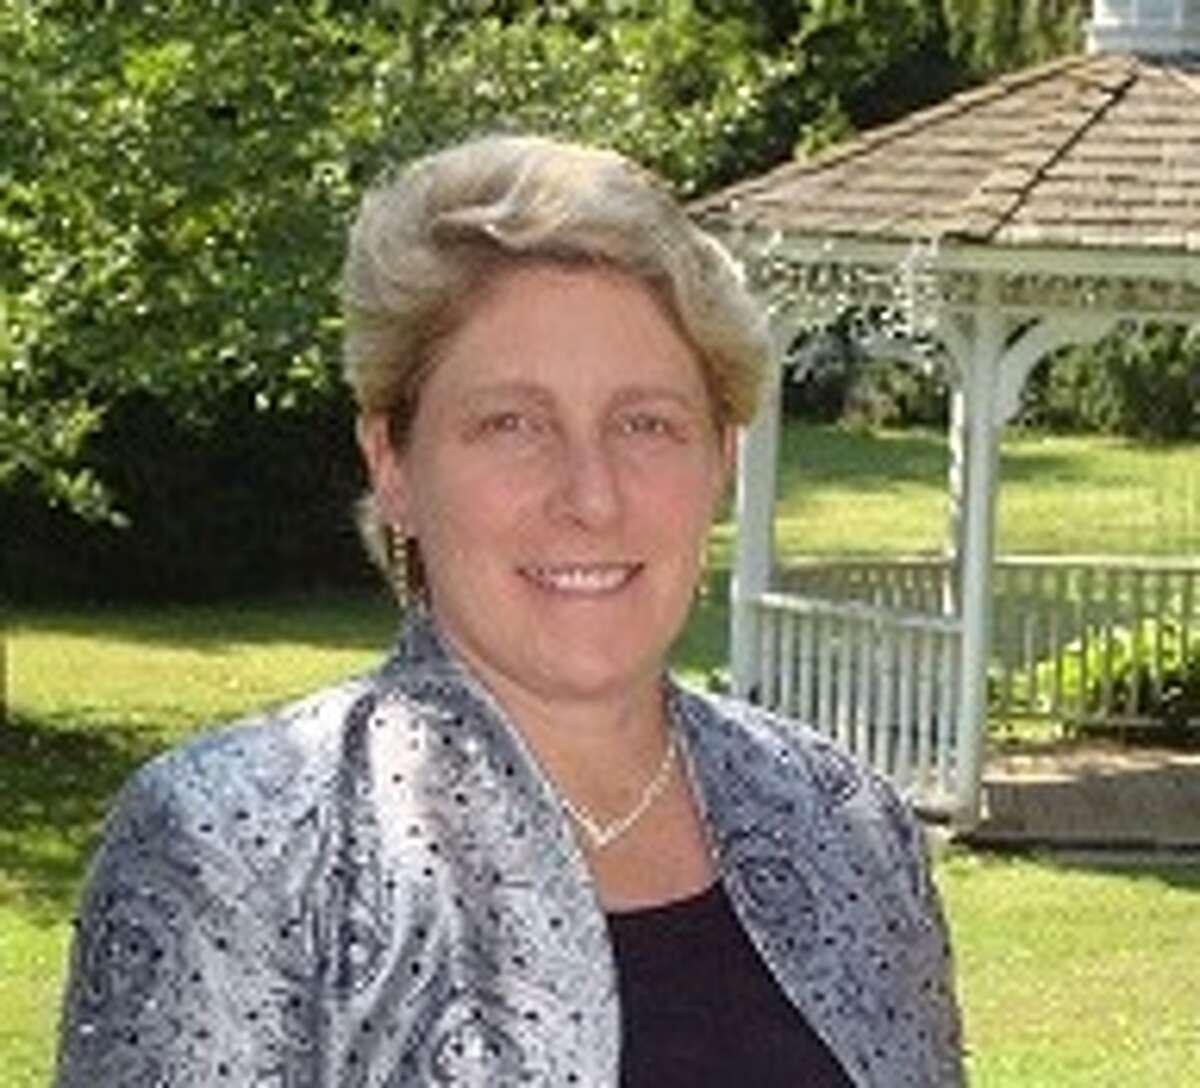 Sgt. Gina Cocchiara, Bethlehem Police Department